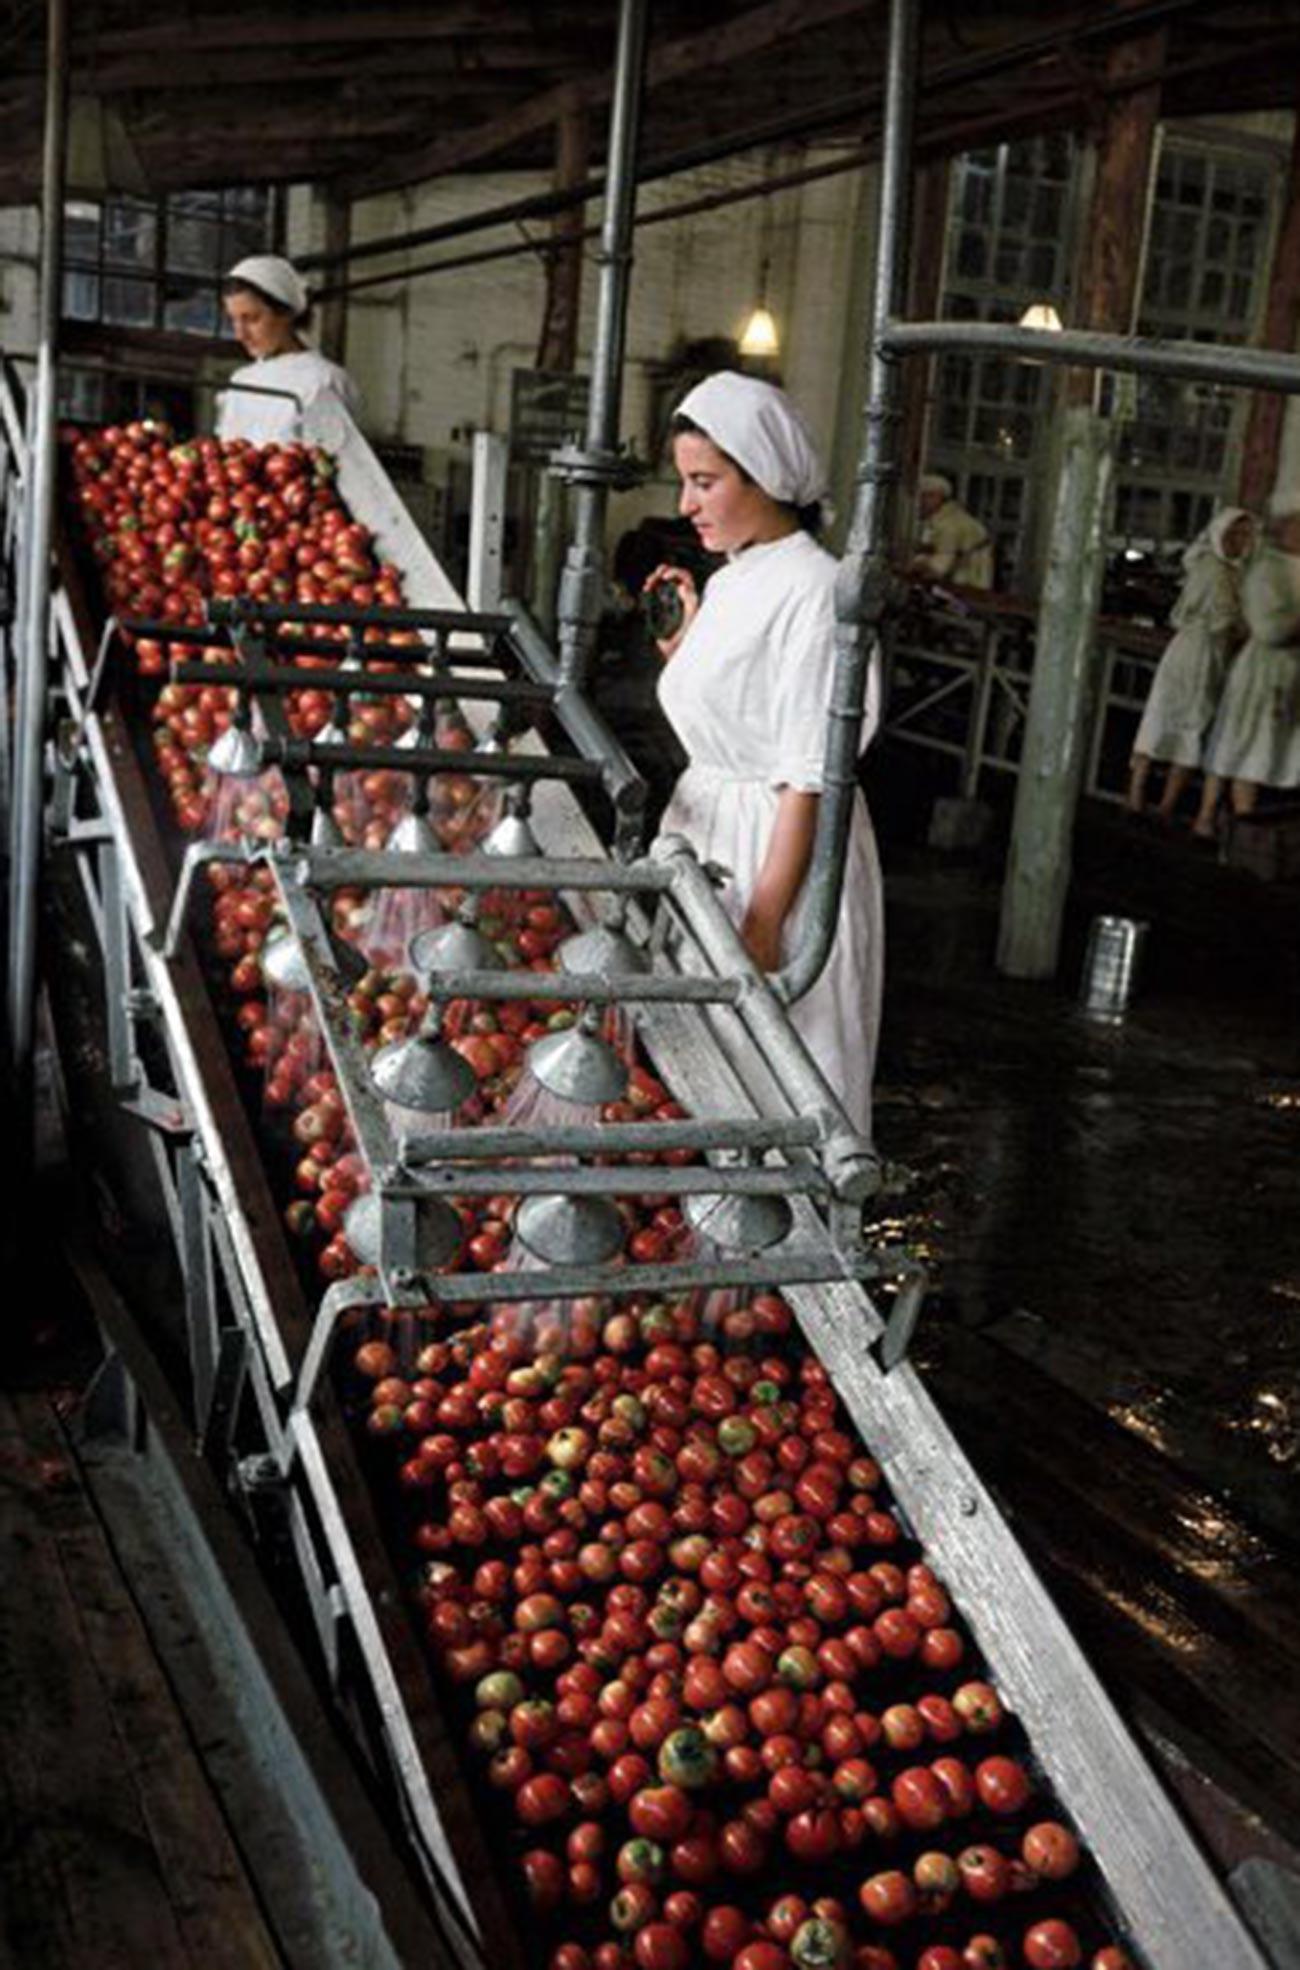 Tomaten in der Konservenfabrik Tiraspol am 1. Mai 1953